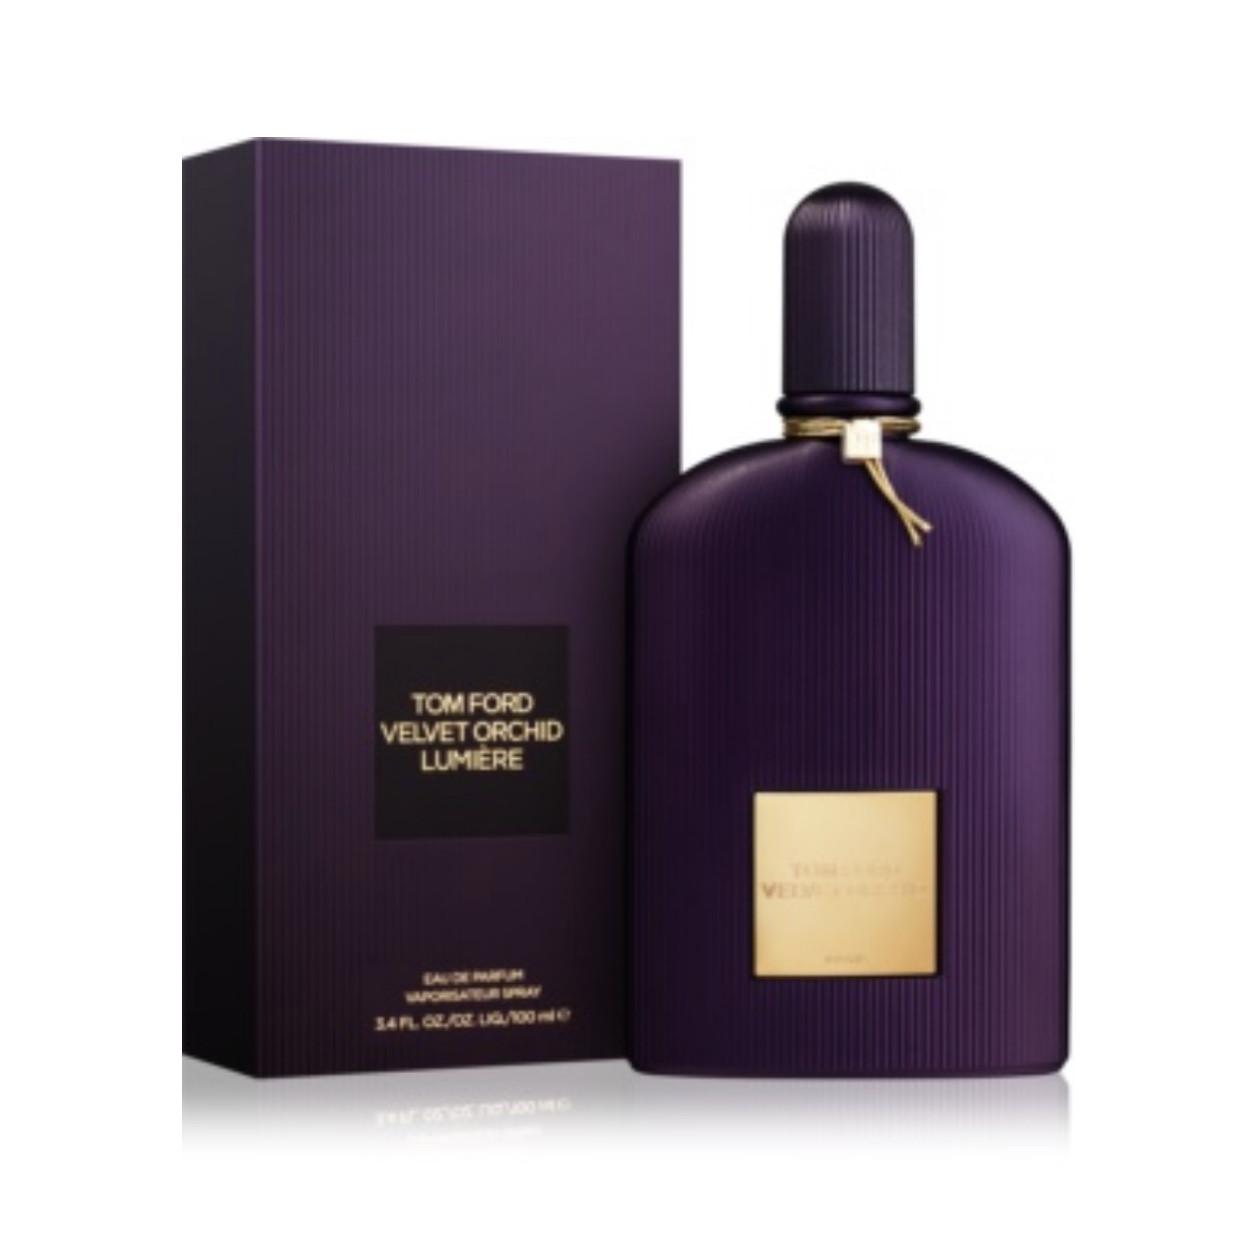 Tom Ford Velvet Orchid Lumiere (Том Форд Вельвет Орхид Люм'єр) парфумована вода 100ml